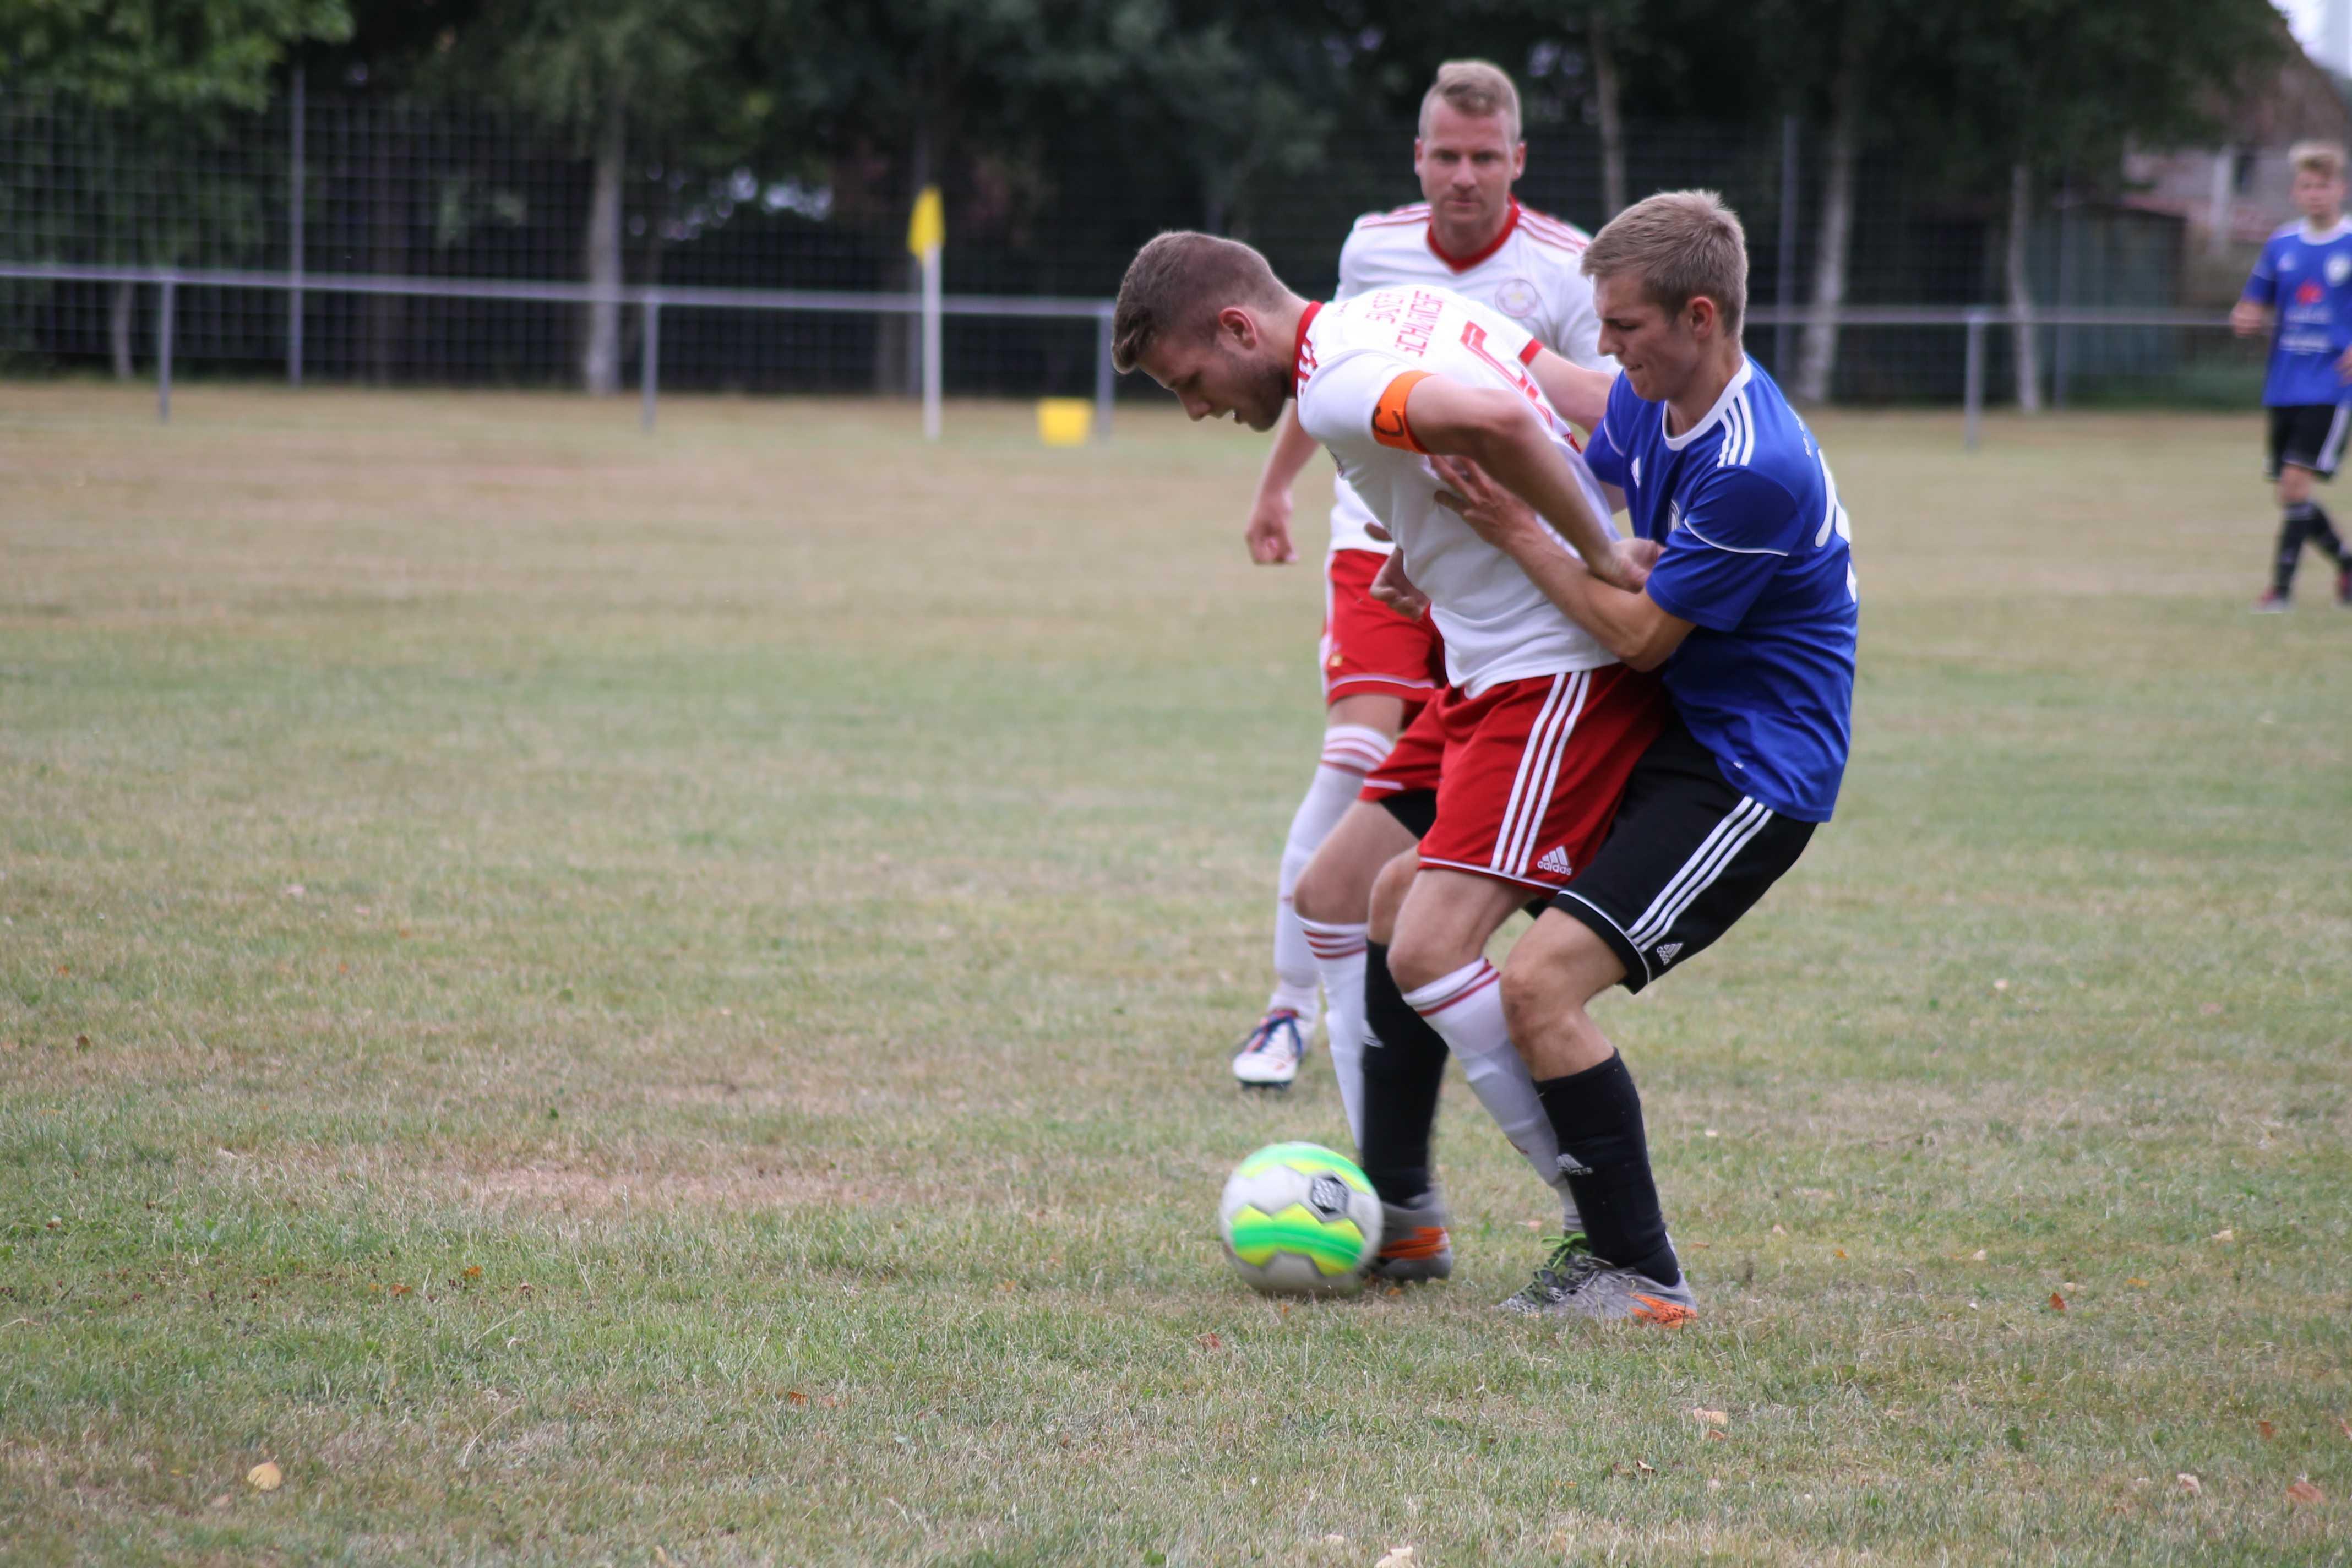 2018-07-29 Sportwoche - Sportpicknick & Football & Fußball (97)